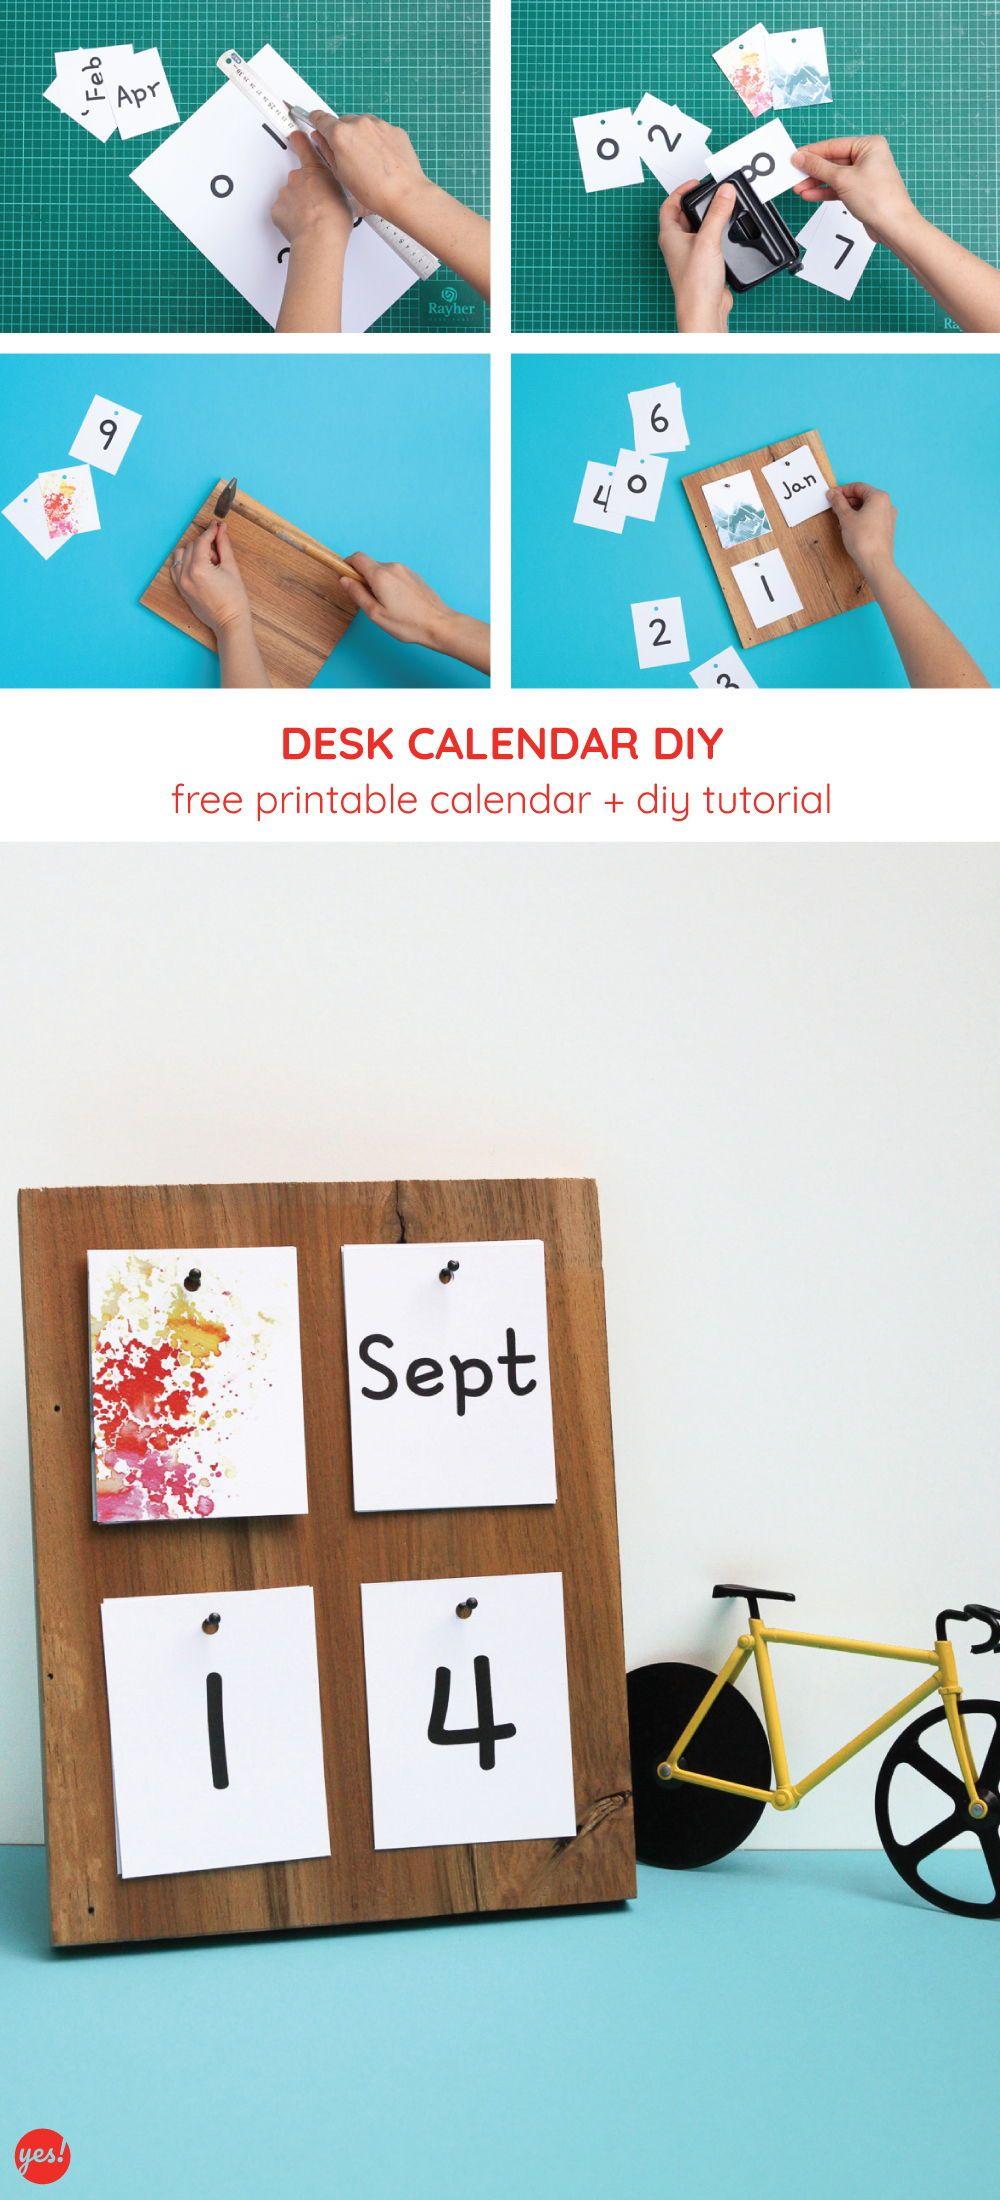 Diy Desk Calendar With A Free Calendar Printable Diy Desk